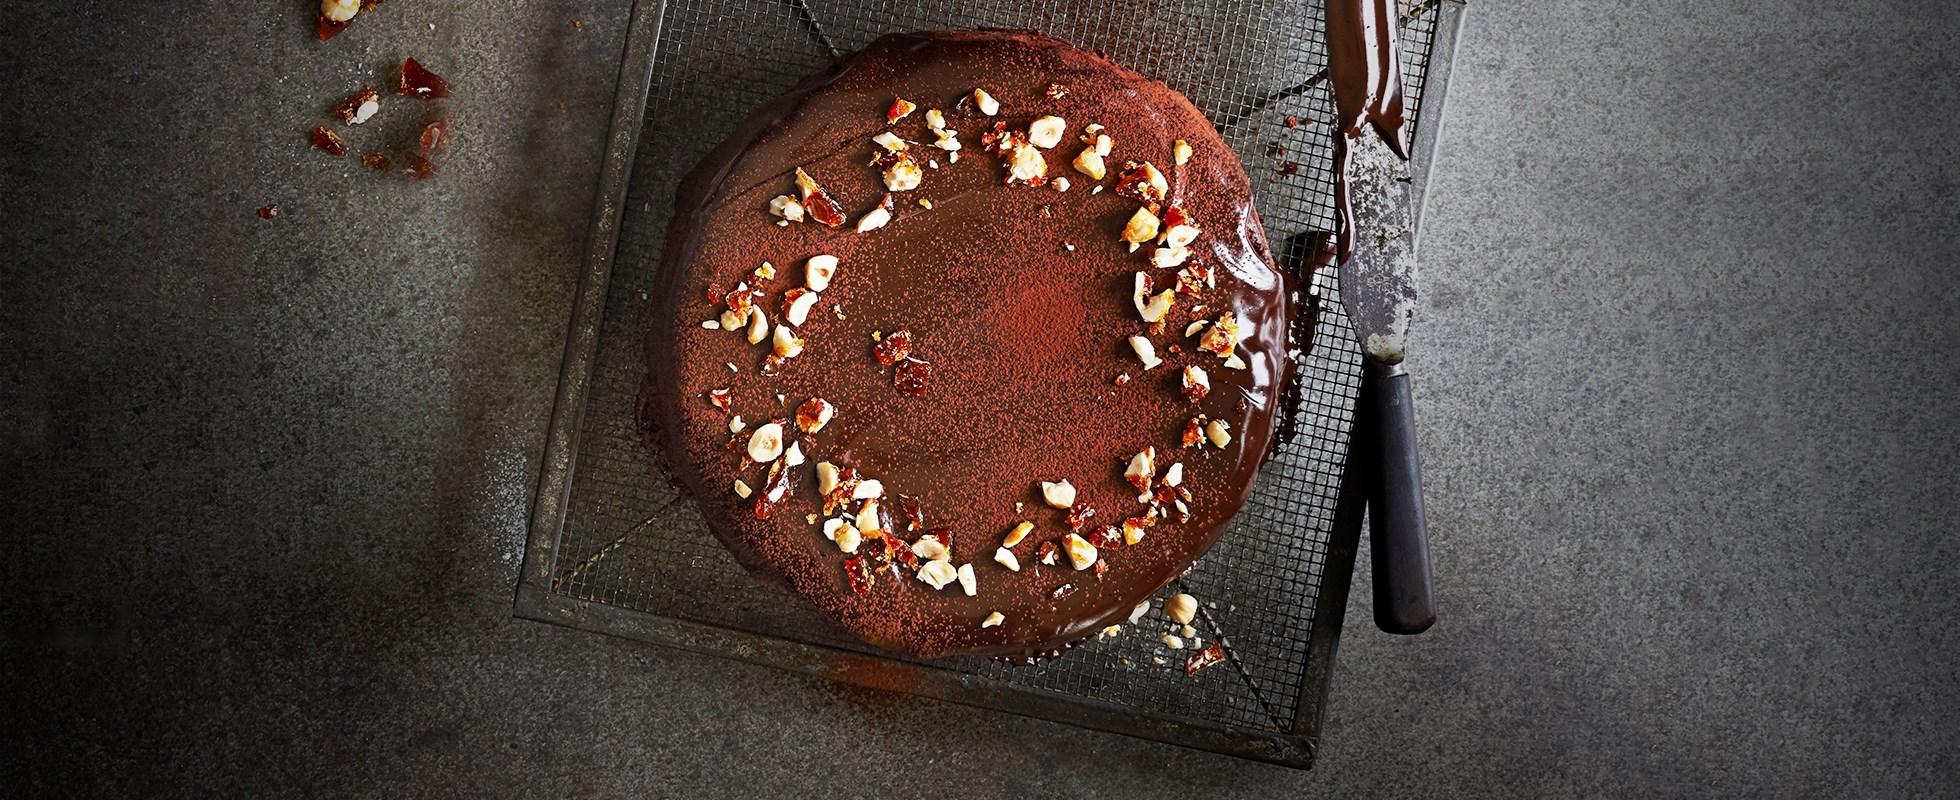 chocolate hazlenut cake